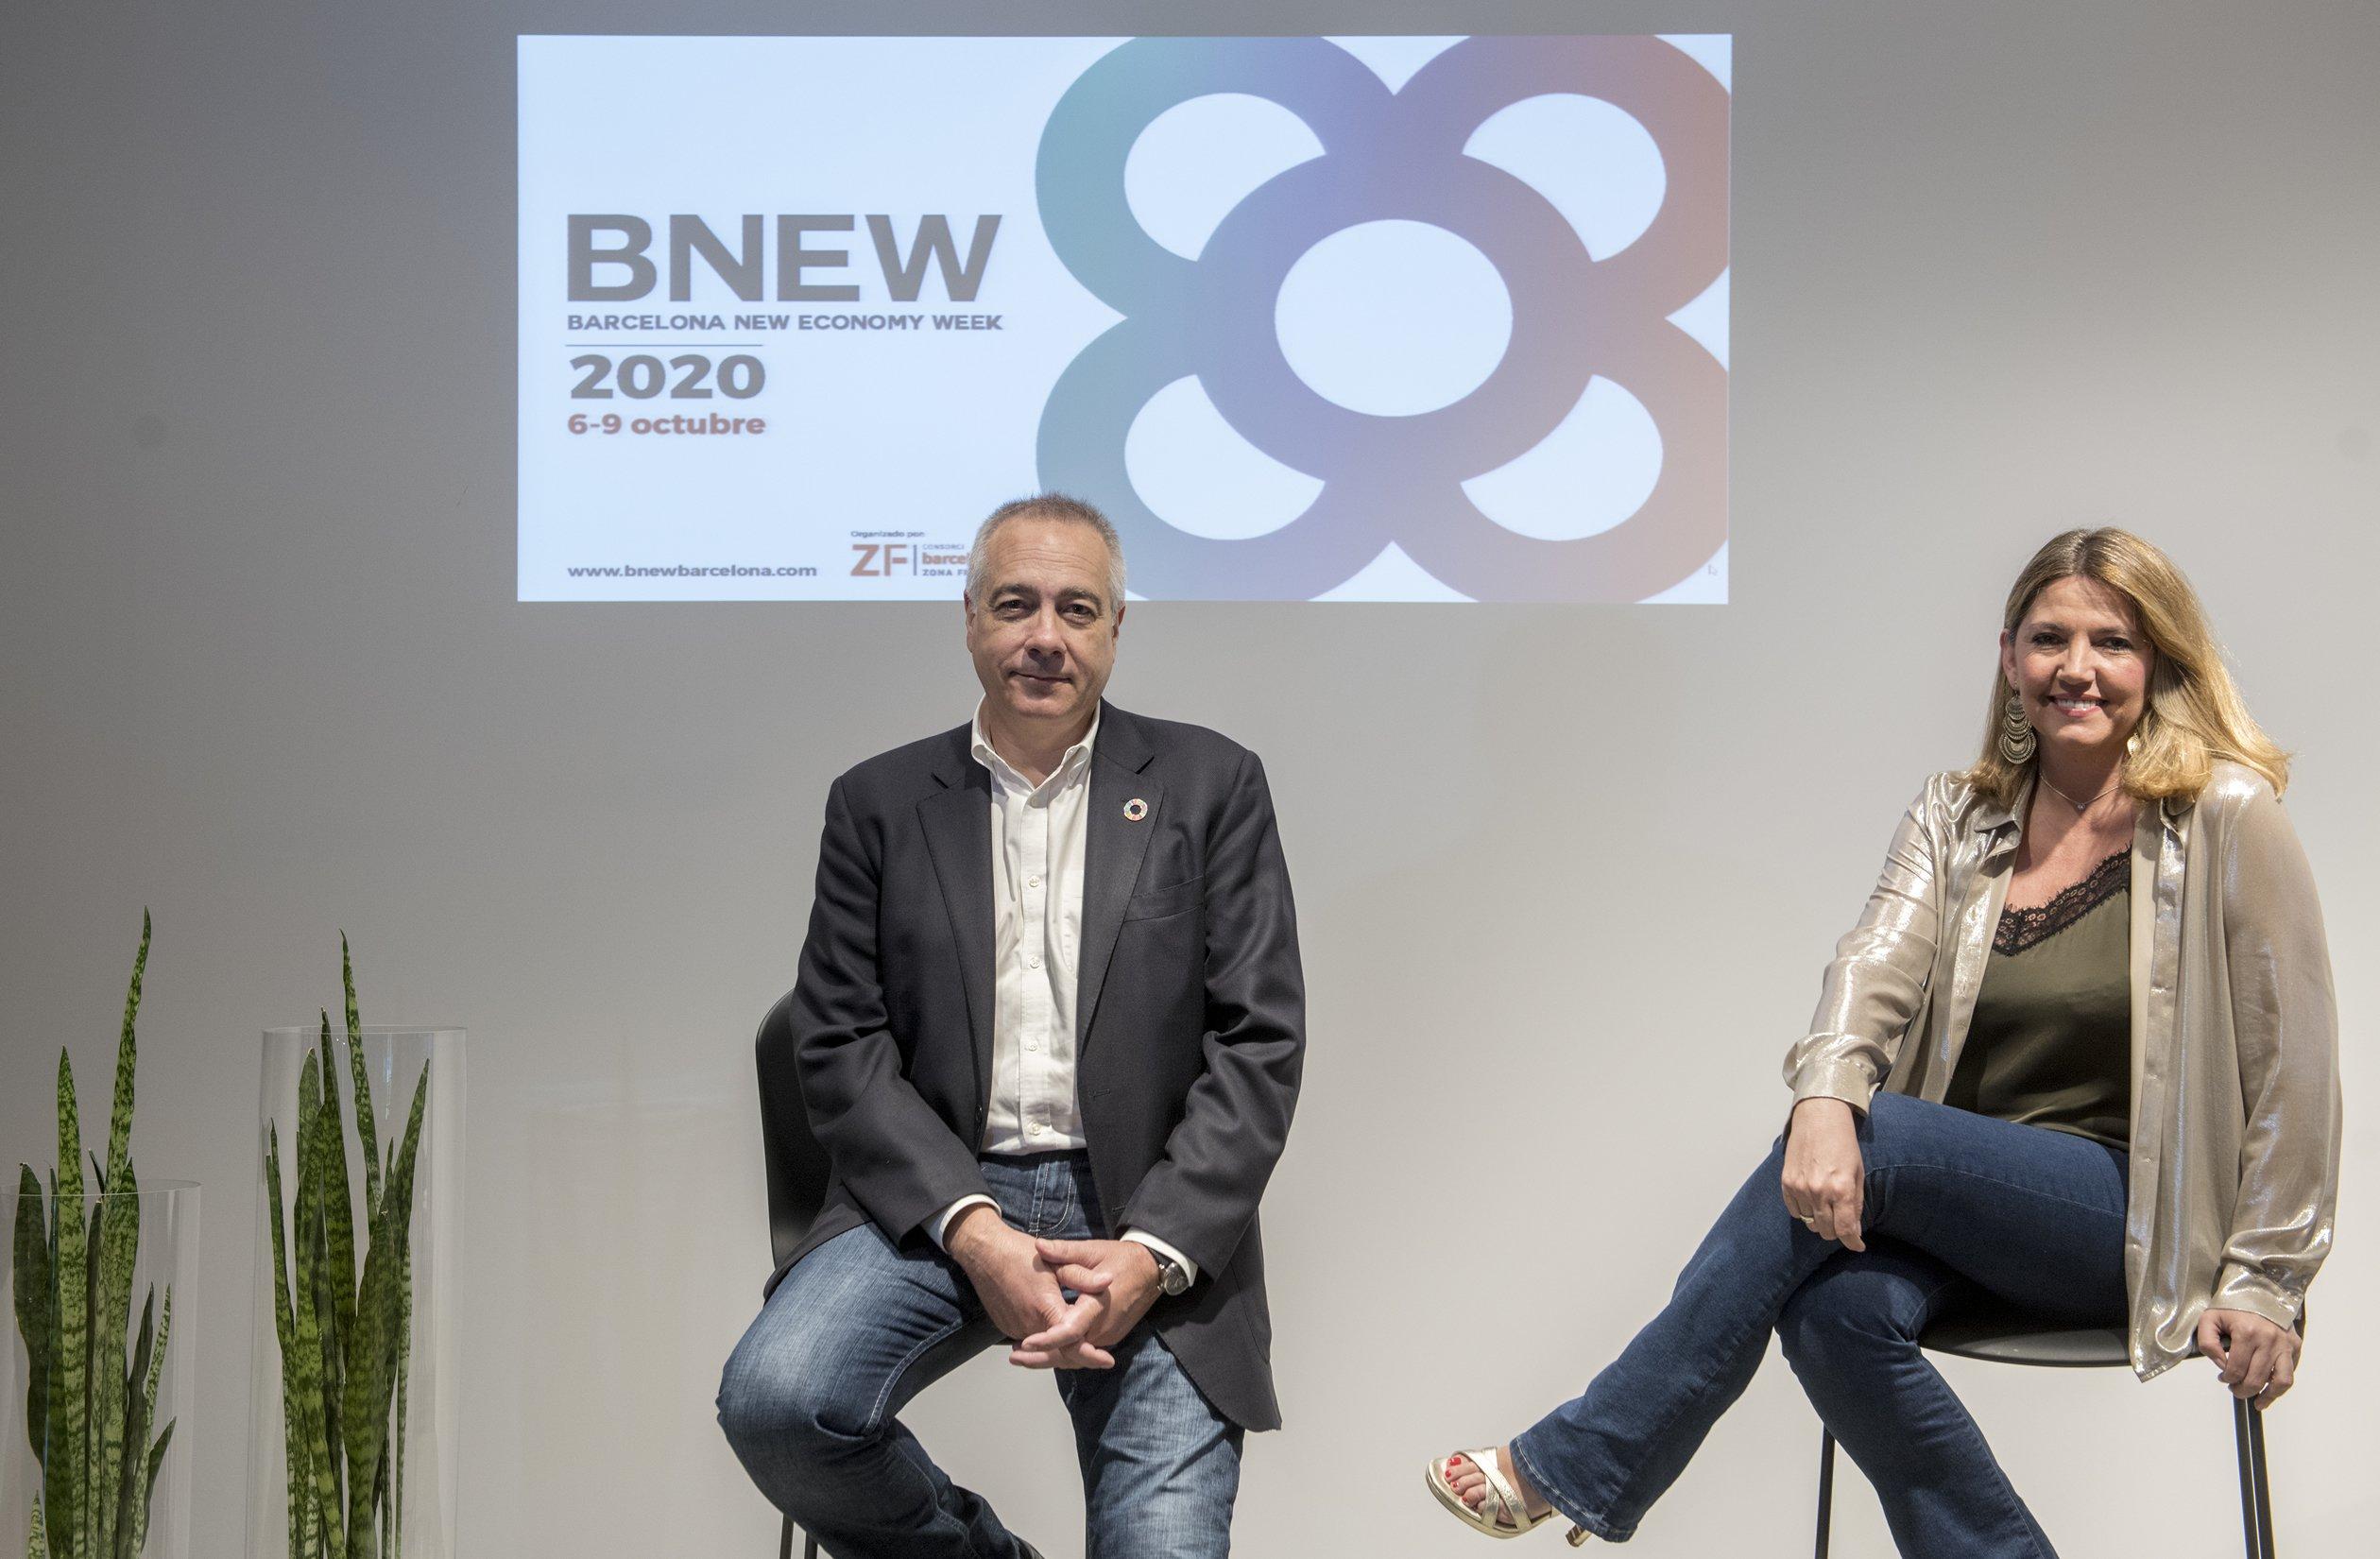 Pere Navarro i Blanca Sorigué